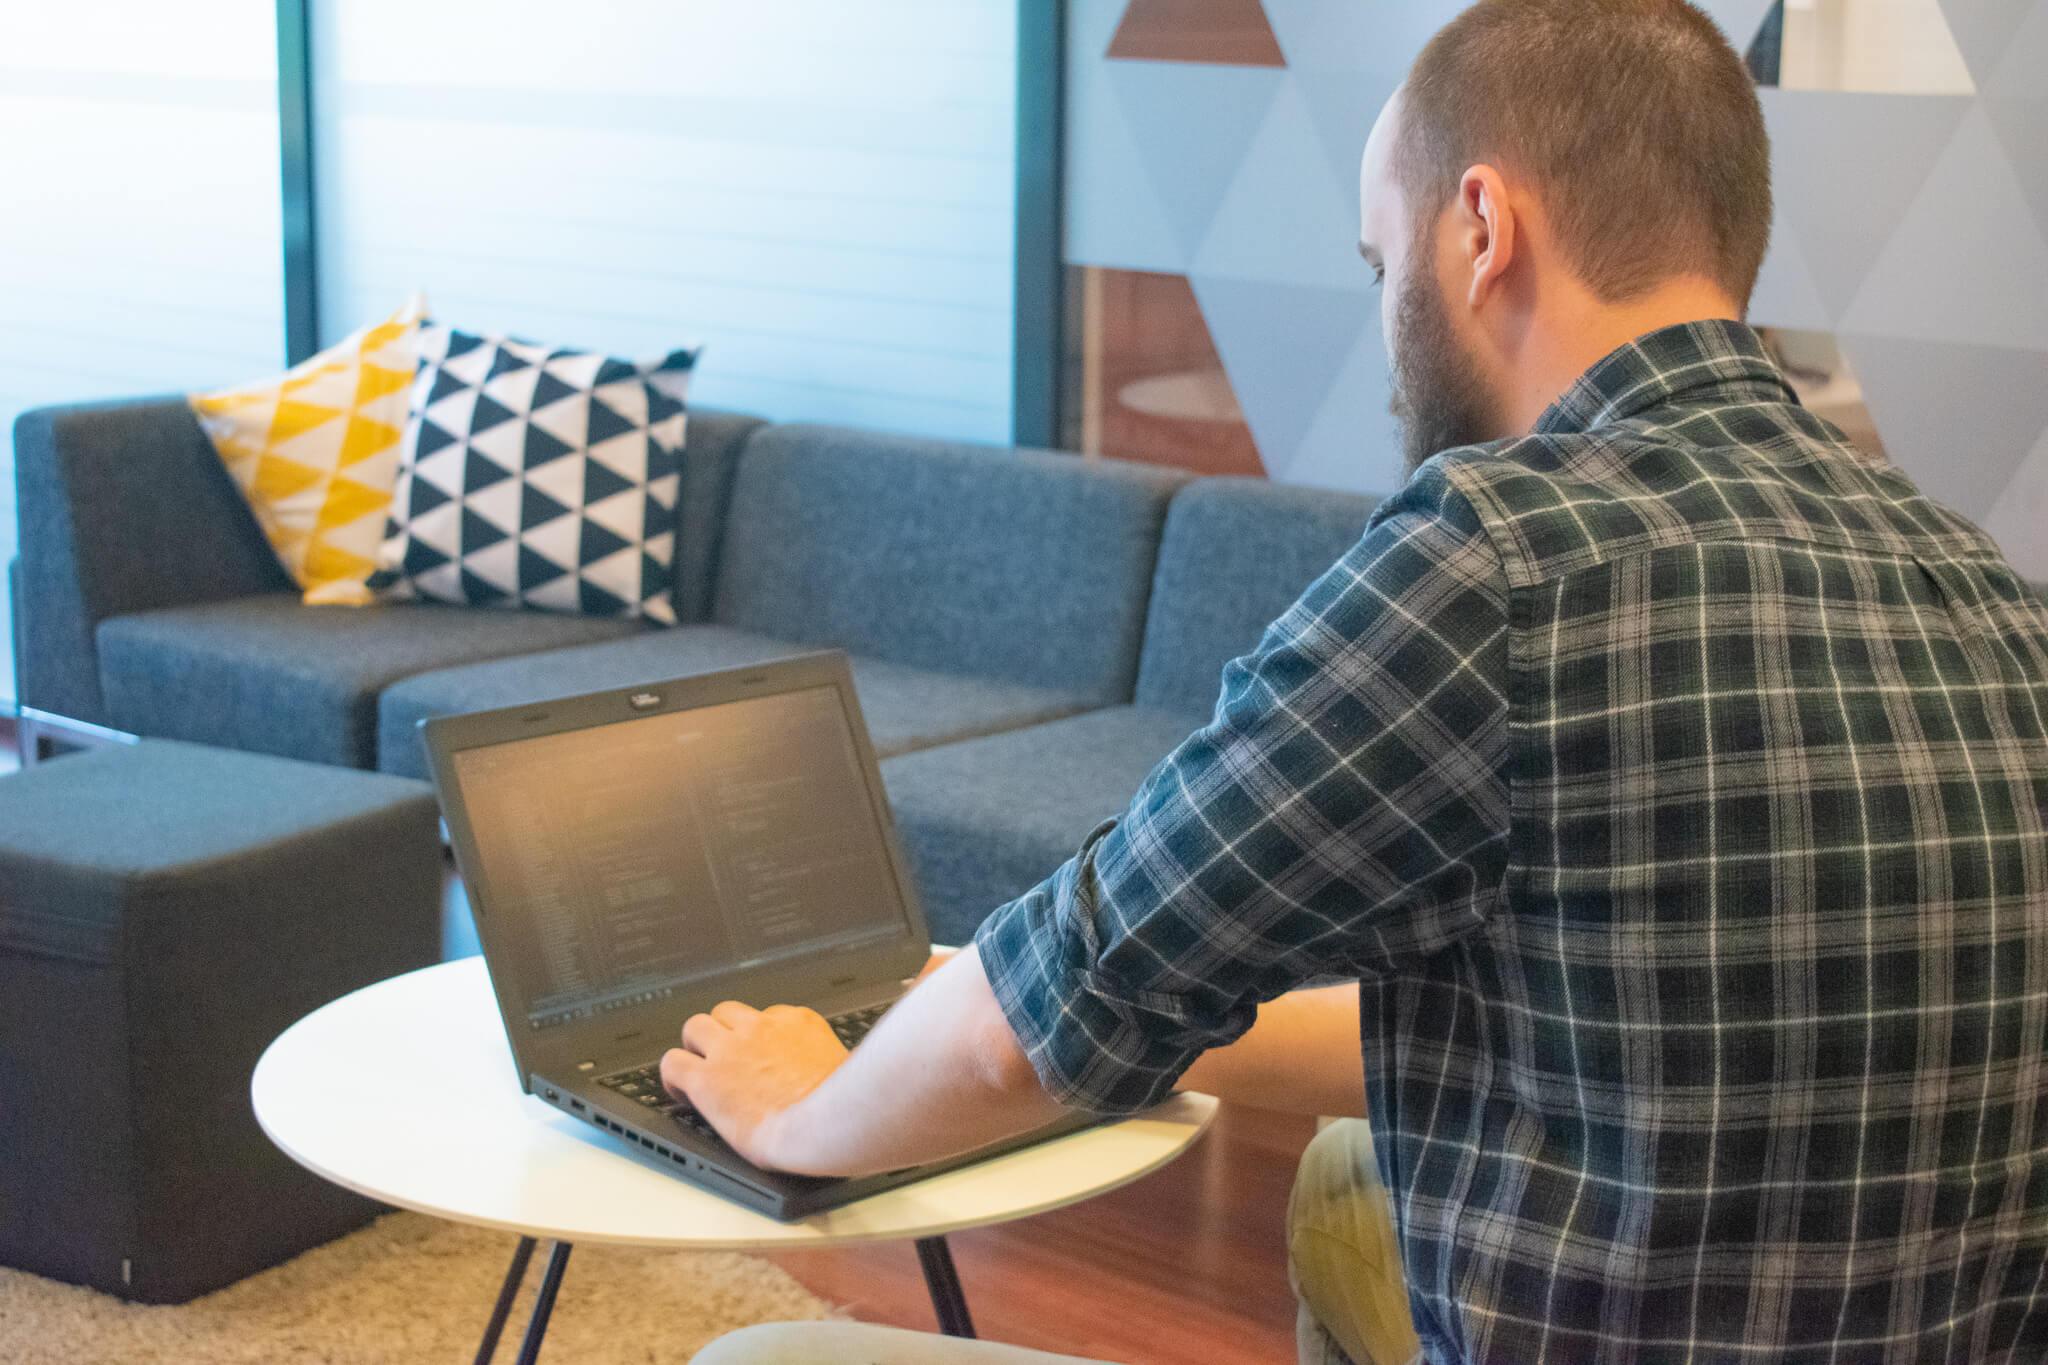 Developer Jevgeni working on simulation software on a laptop